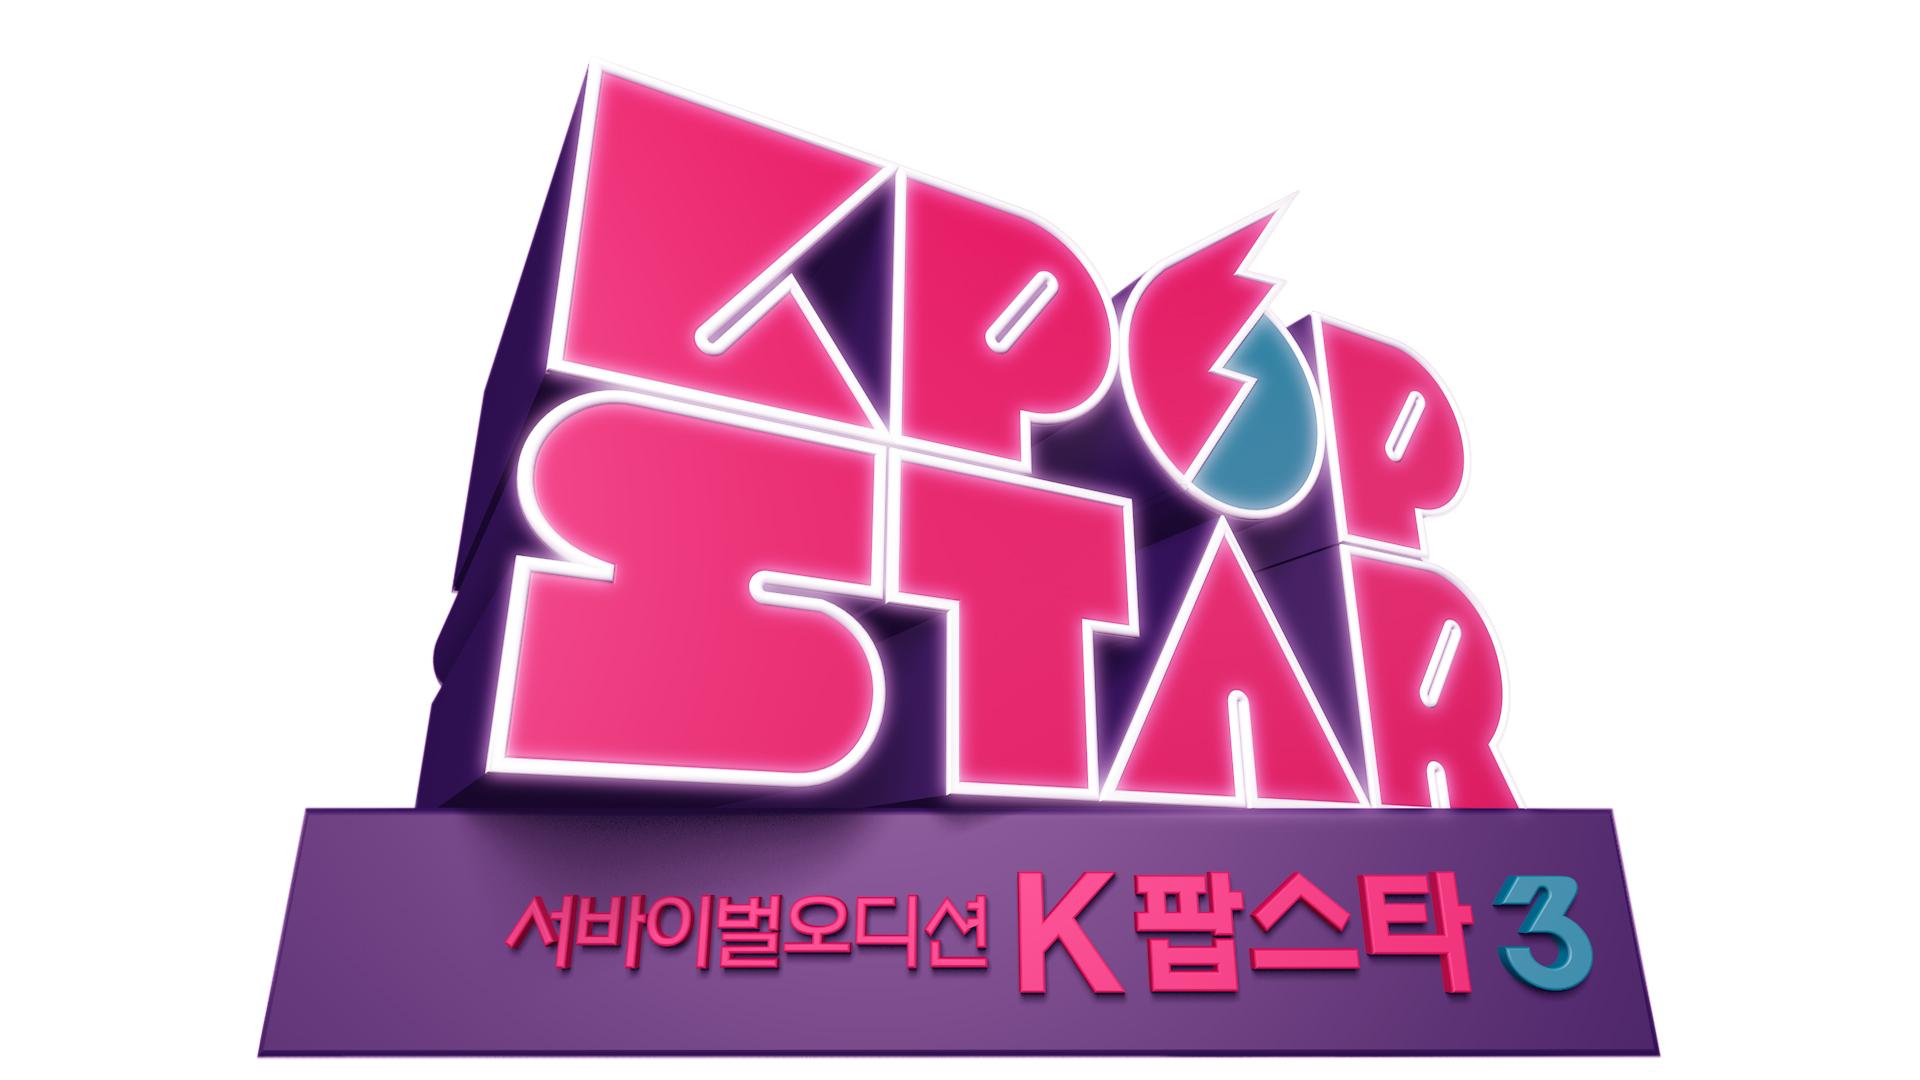 K-pop Star logo